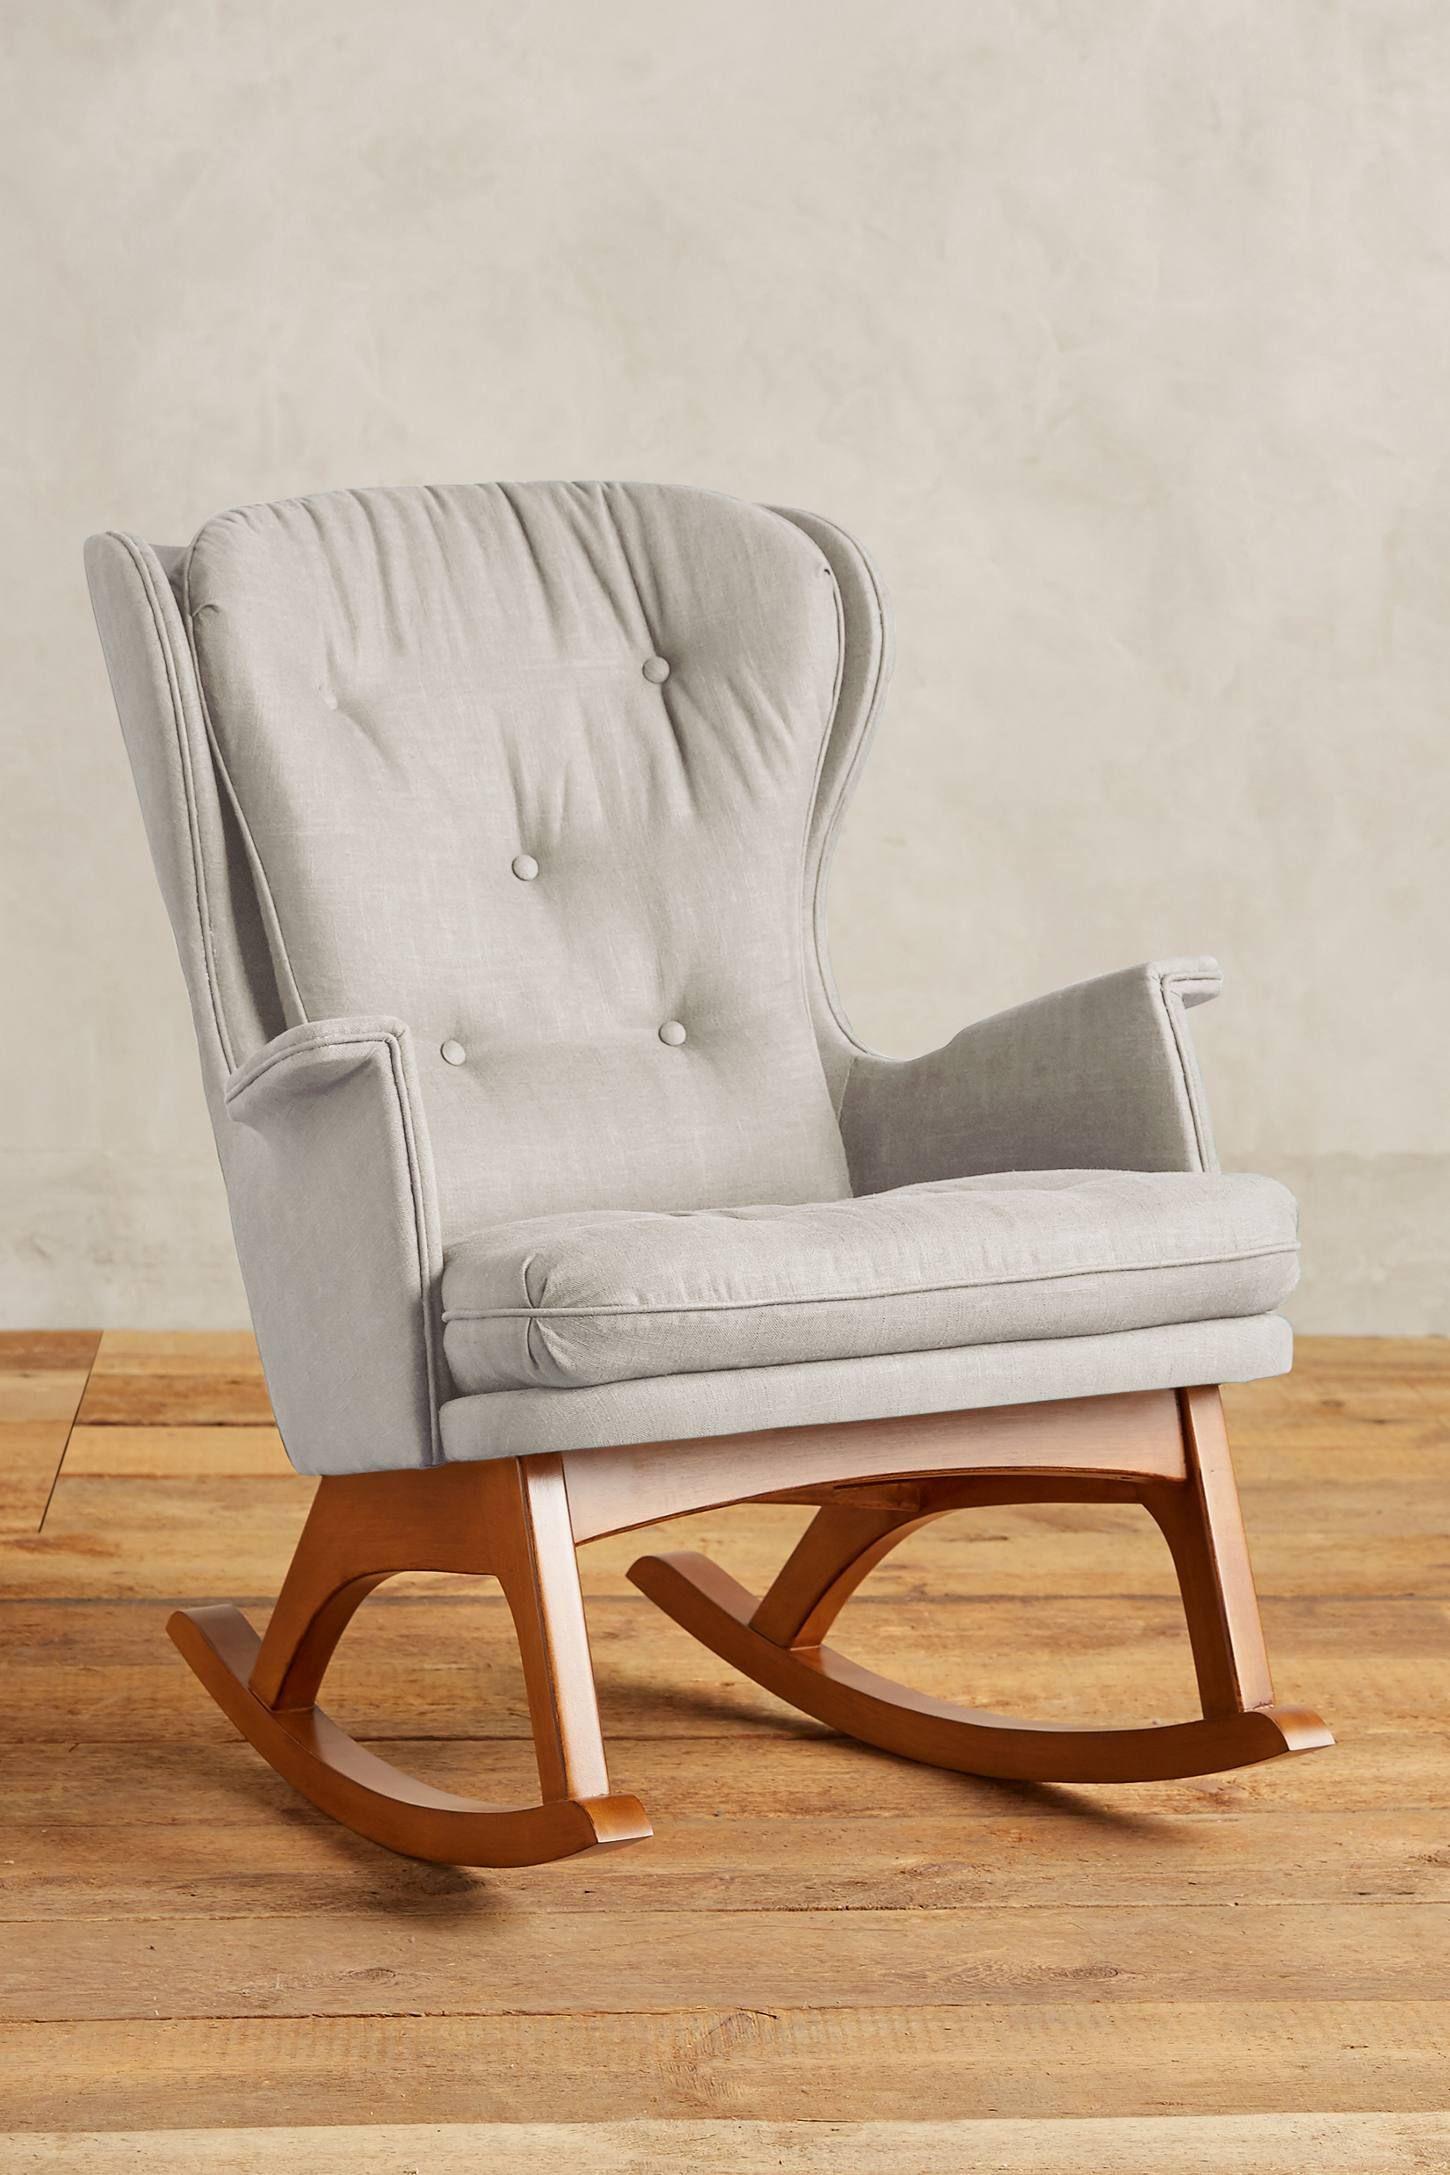 Belgian Linen Finn Rocker Rocking Chair Unique Living Room